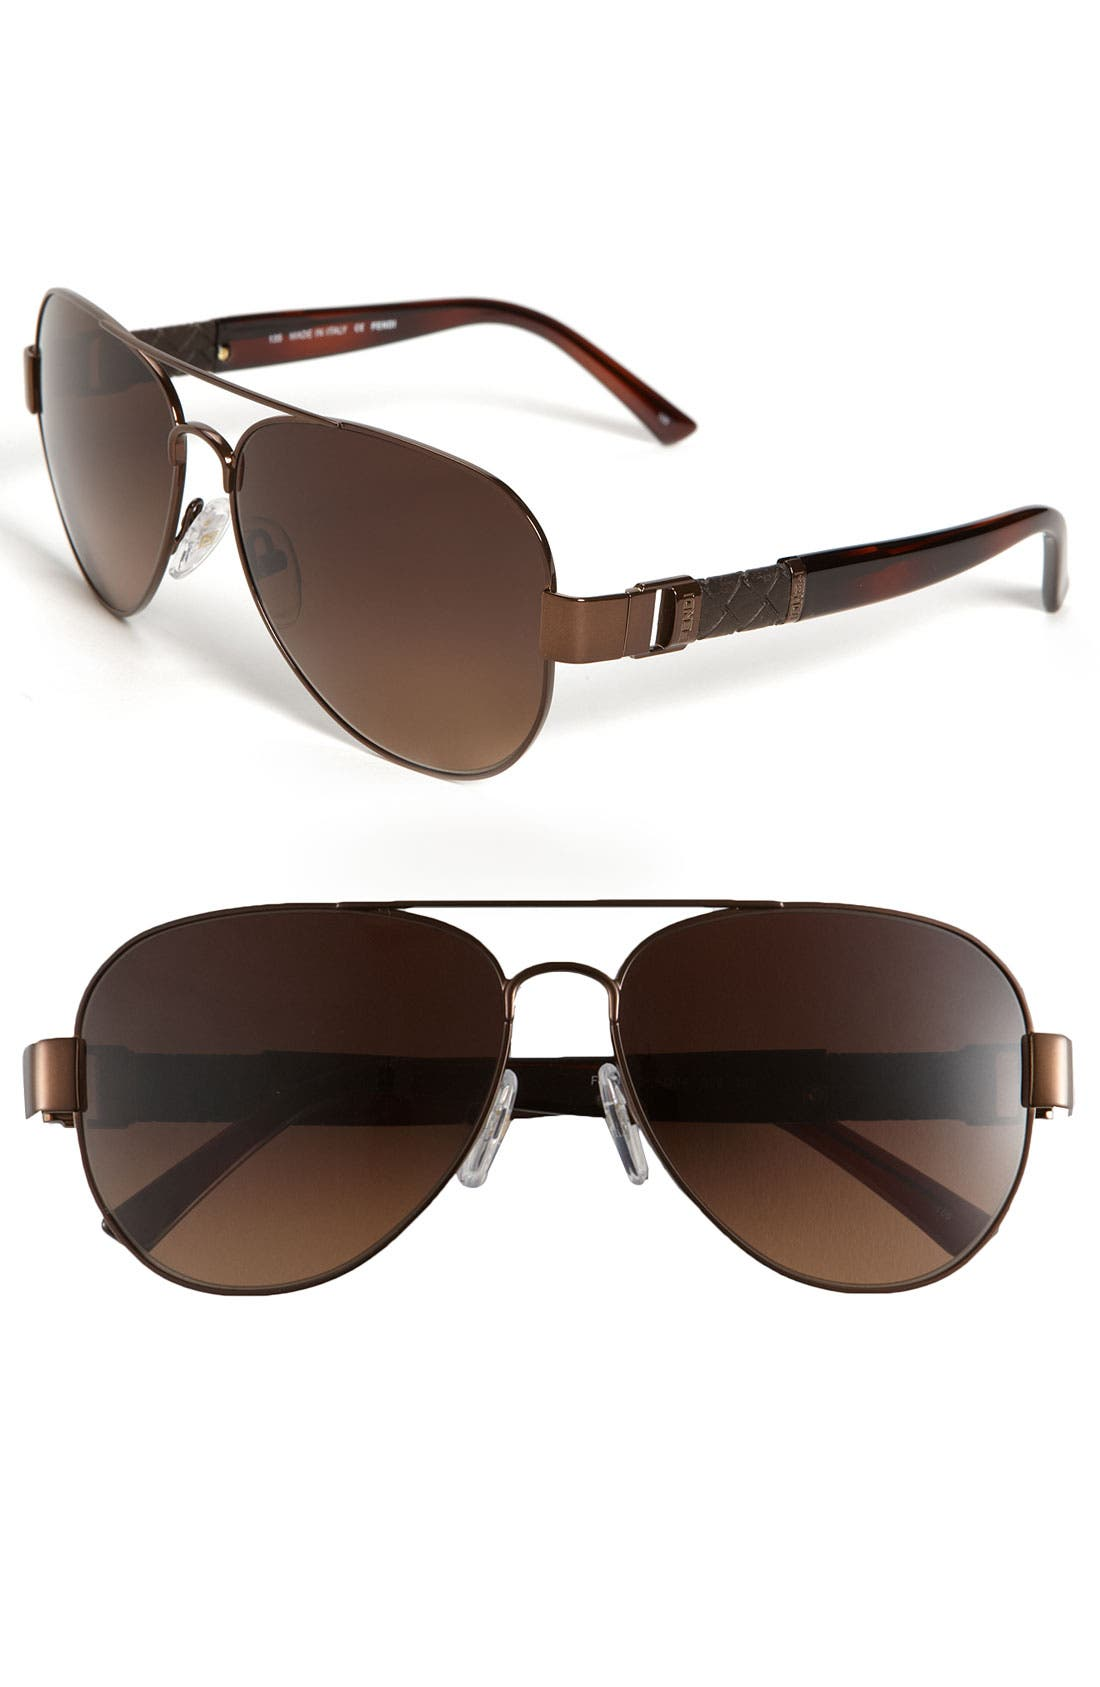 Main Image - Fendi Metal Aviator Sunglasses